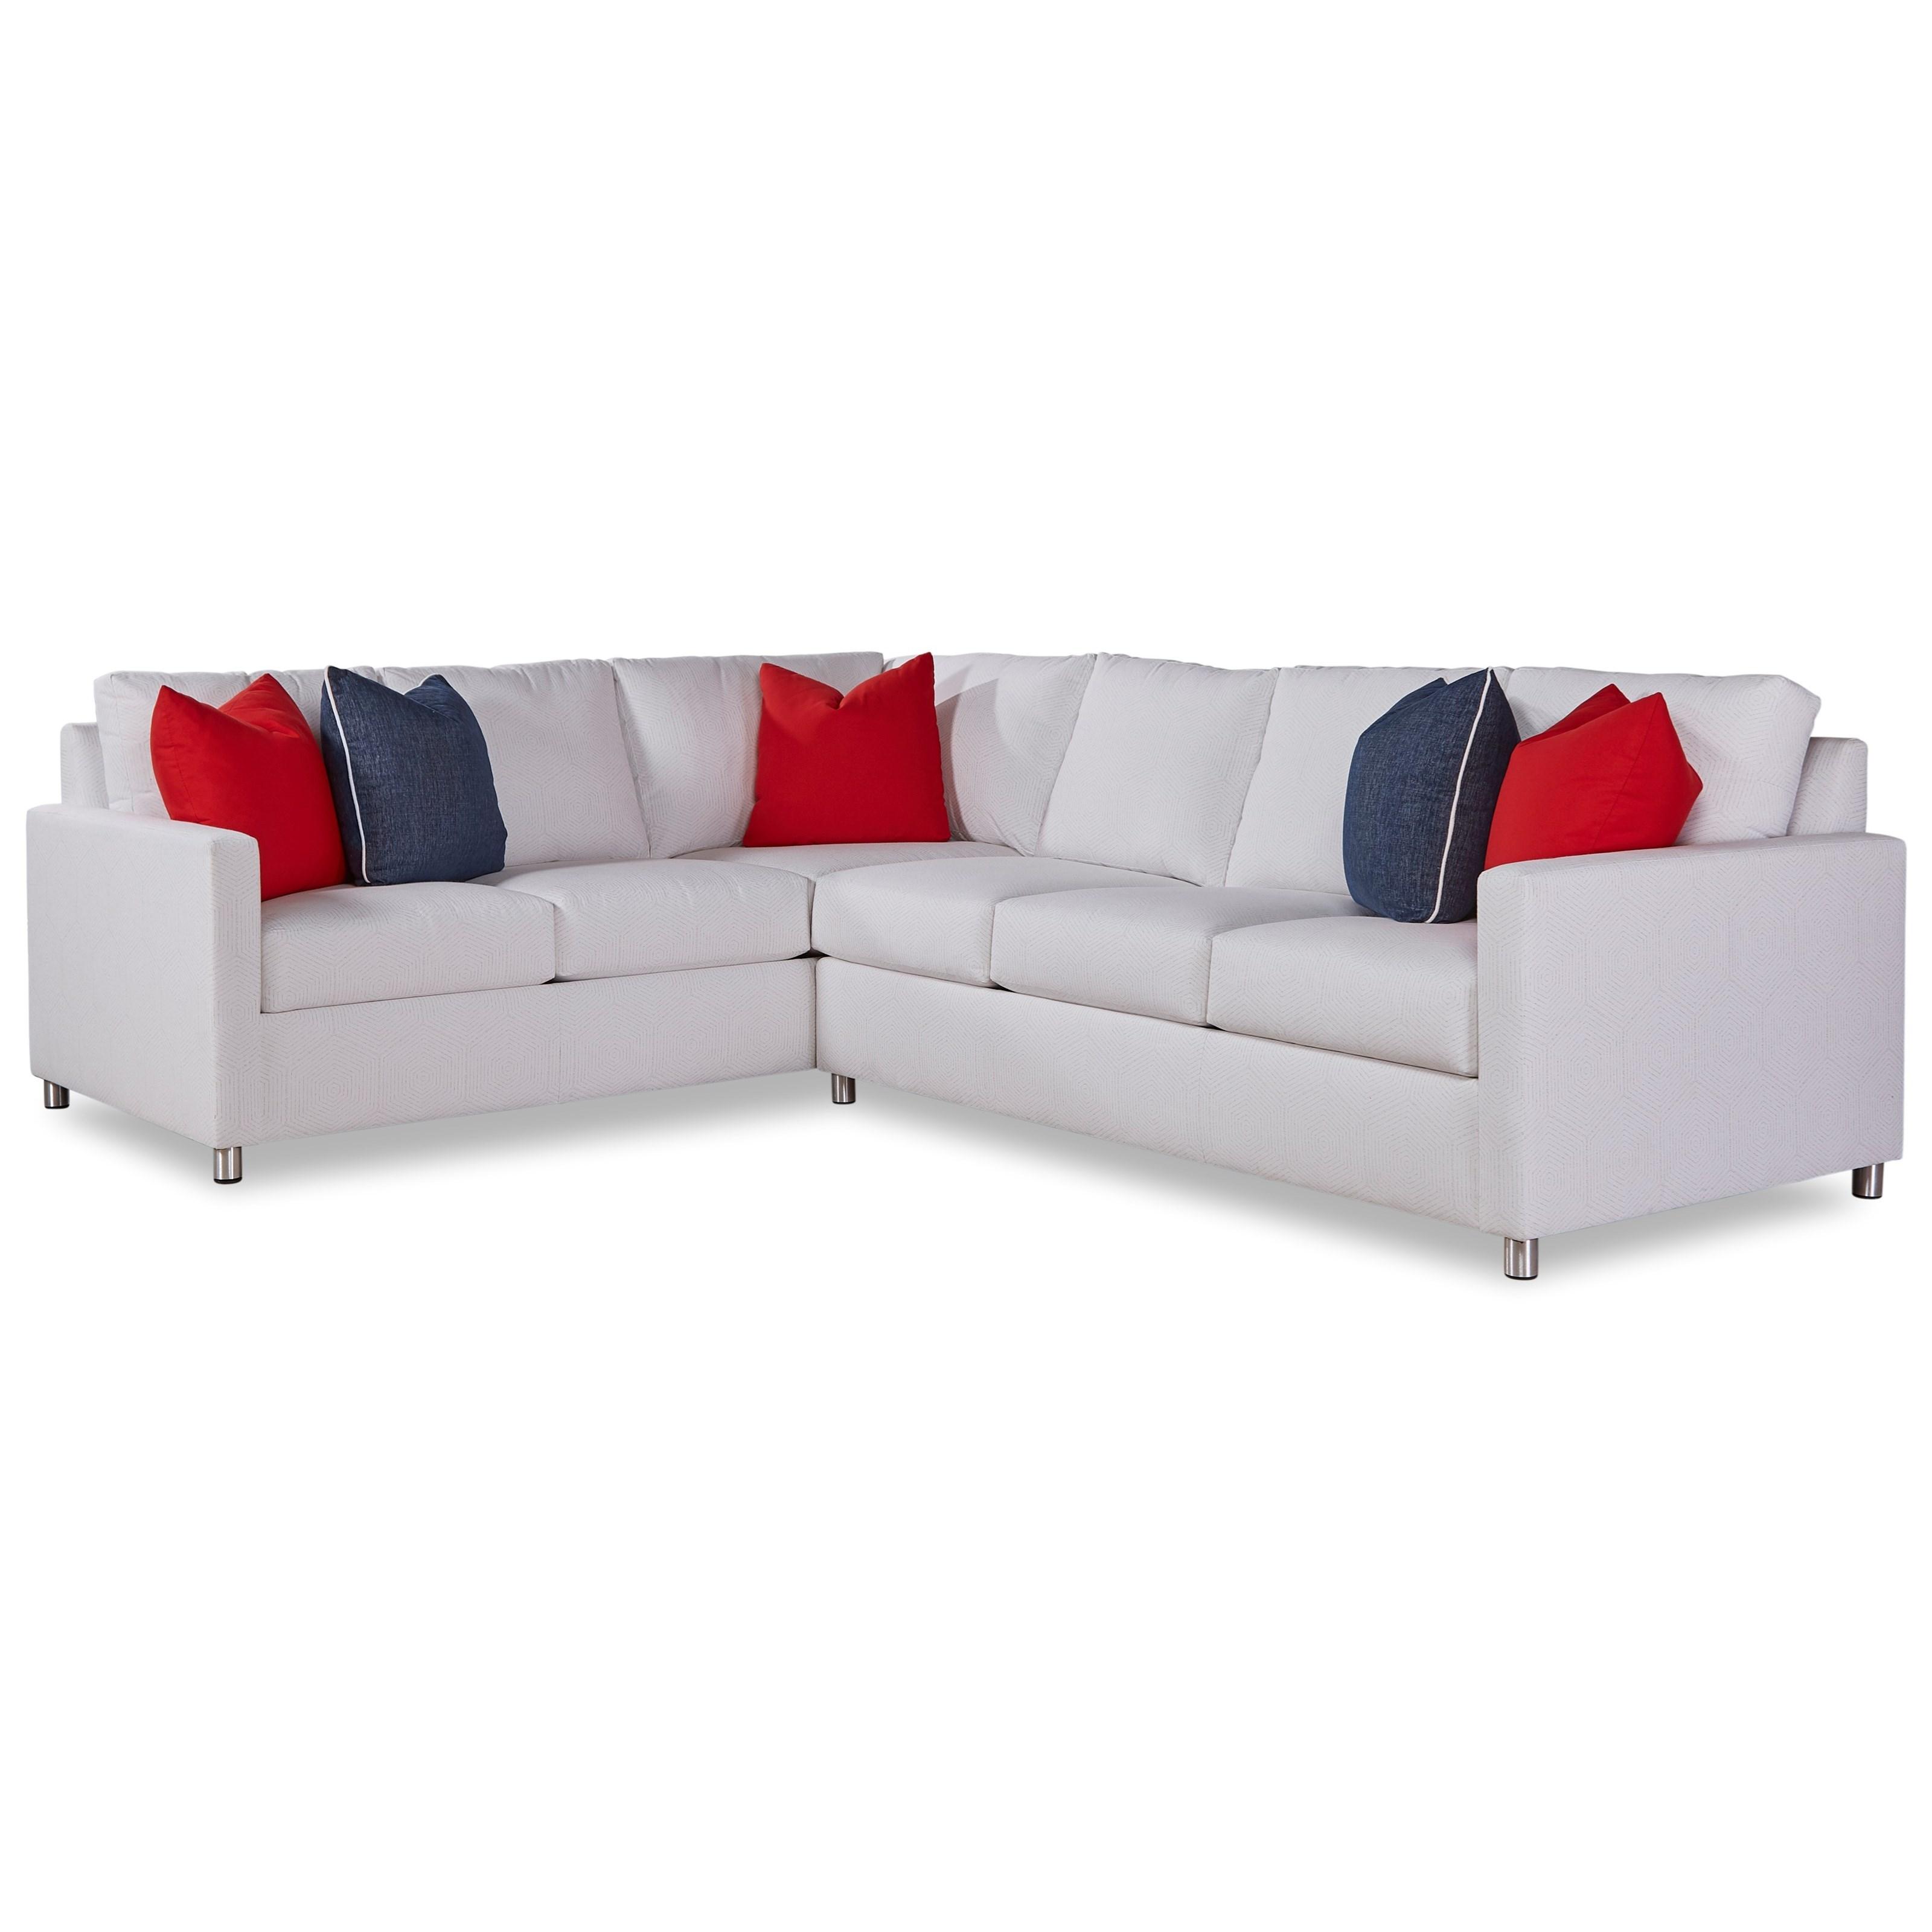 9100 Outdoor Sectional by Geoffrey Alexander at Sprintz Furniture